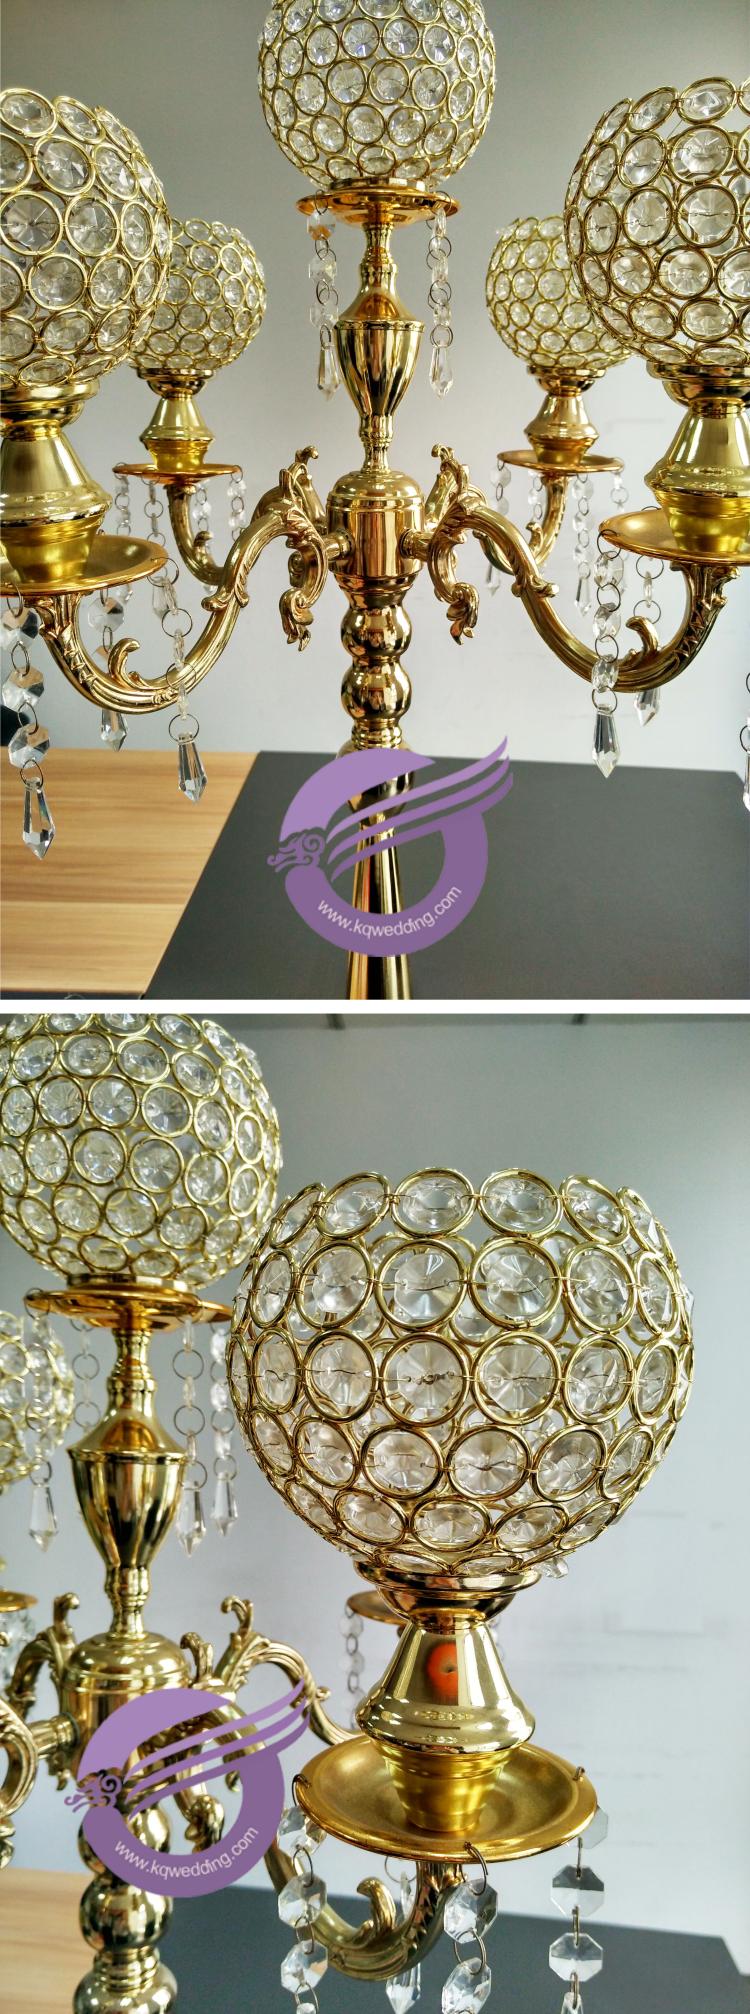 Zt wholesale wedding crystal globe centerpieces arm